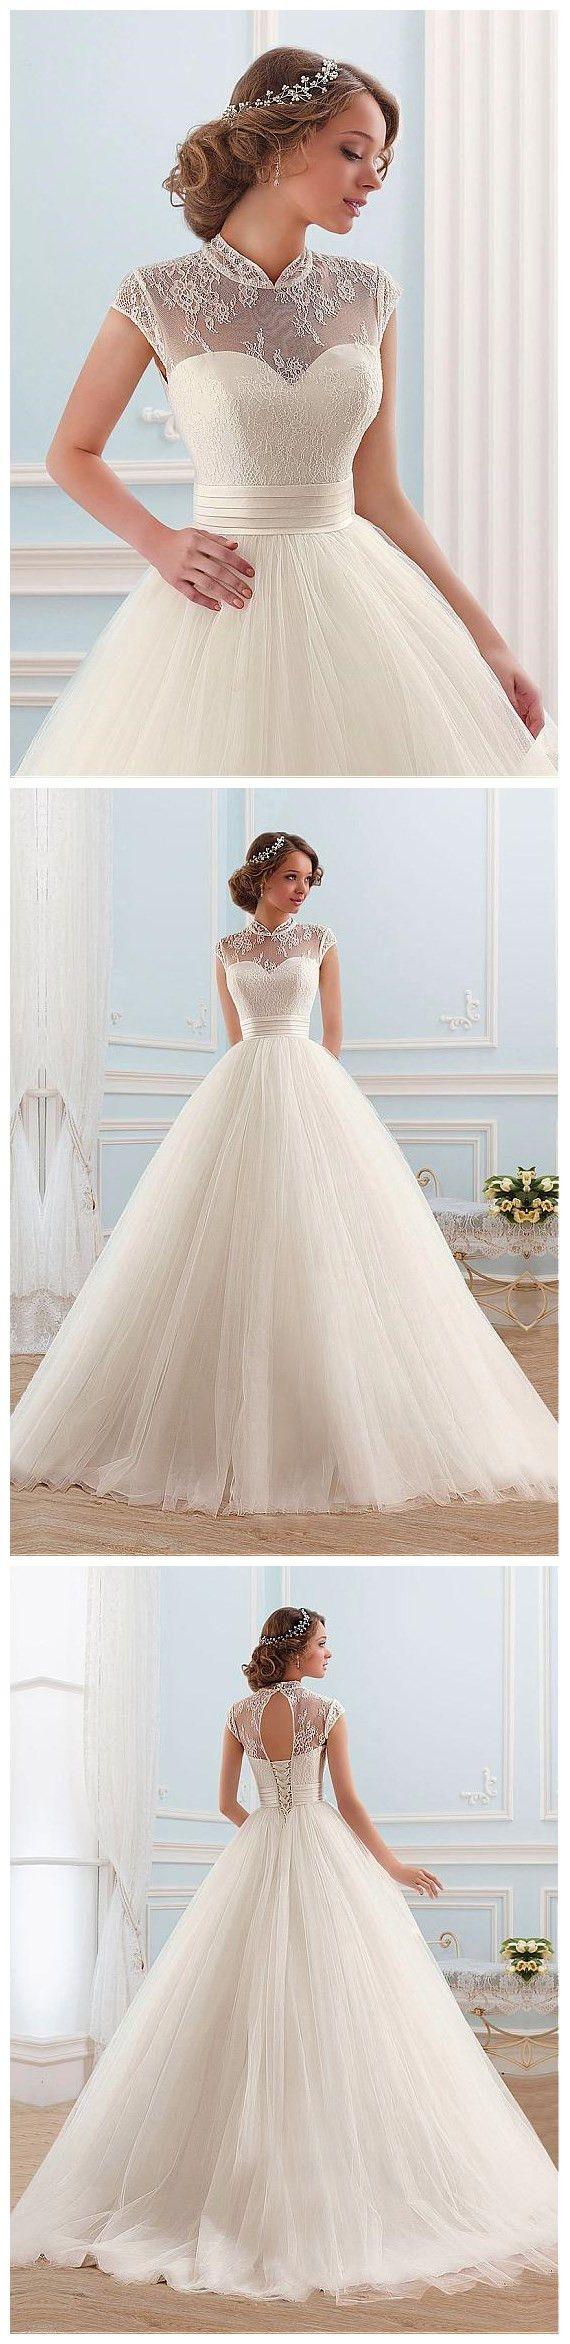 Glamorous tulle high collar neckline ball gown wedding dress high